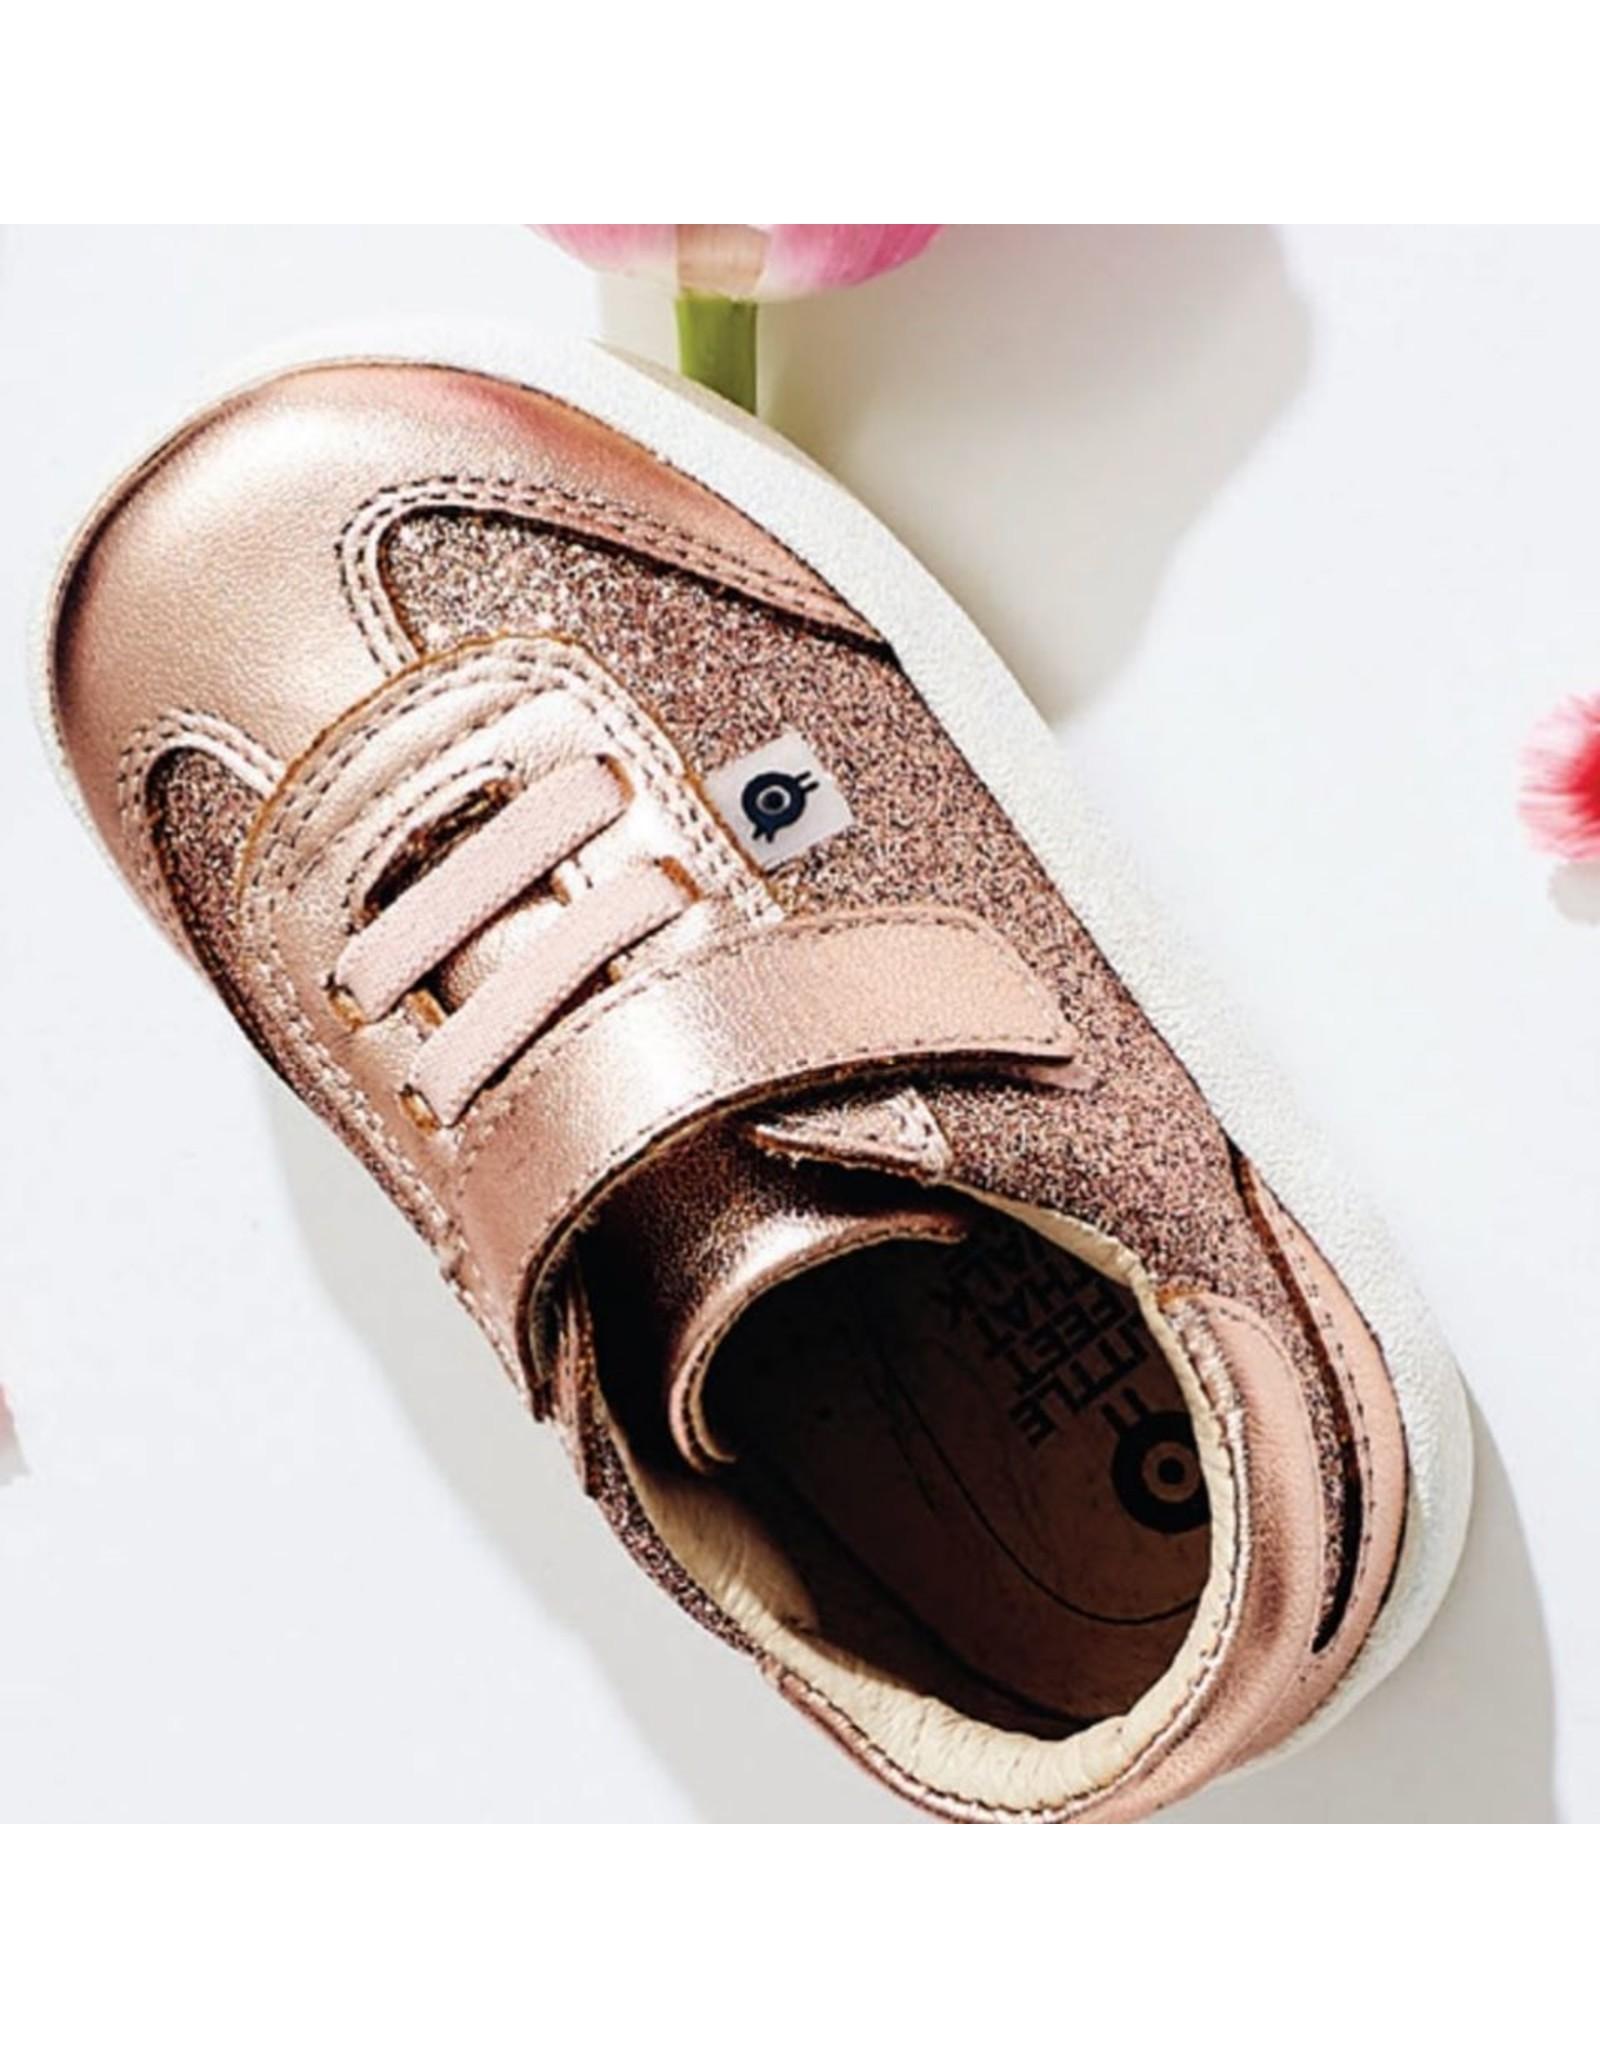 Oldsoles OLDSOLES Glam Sneaker Copper